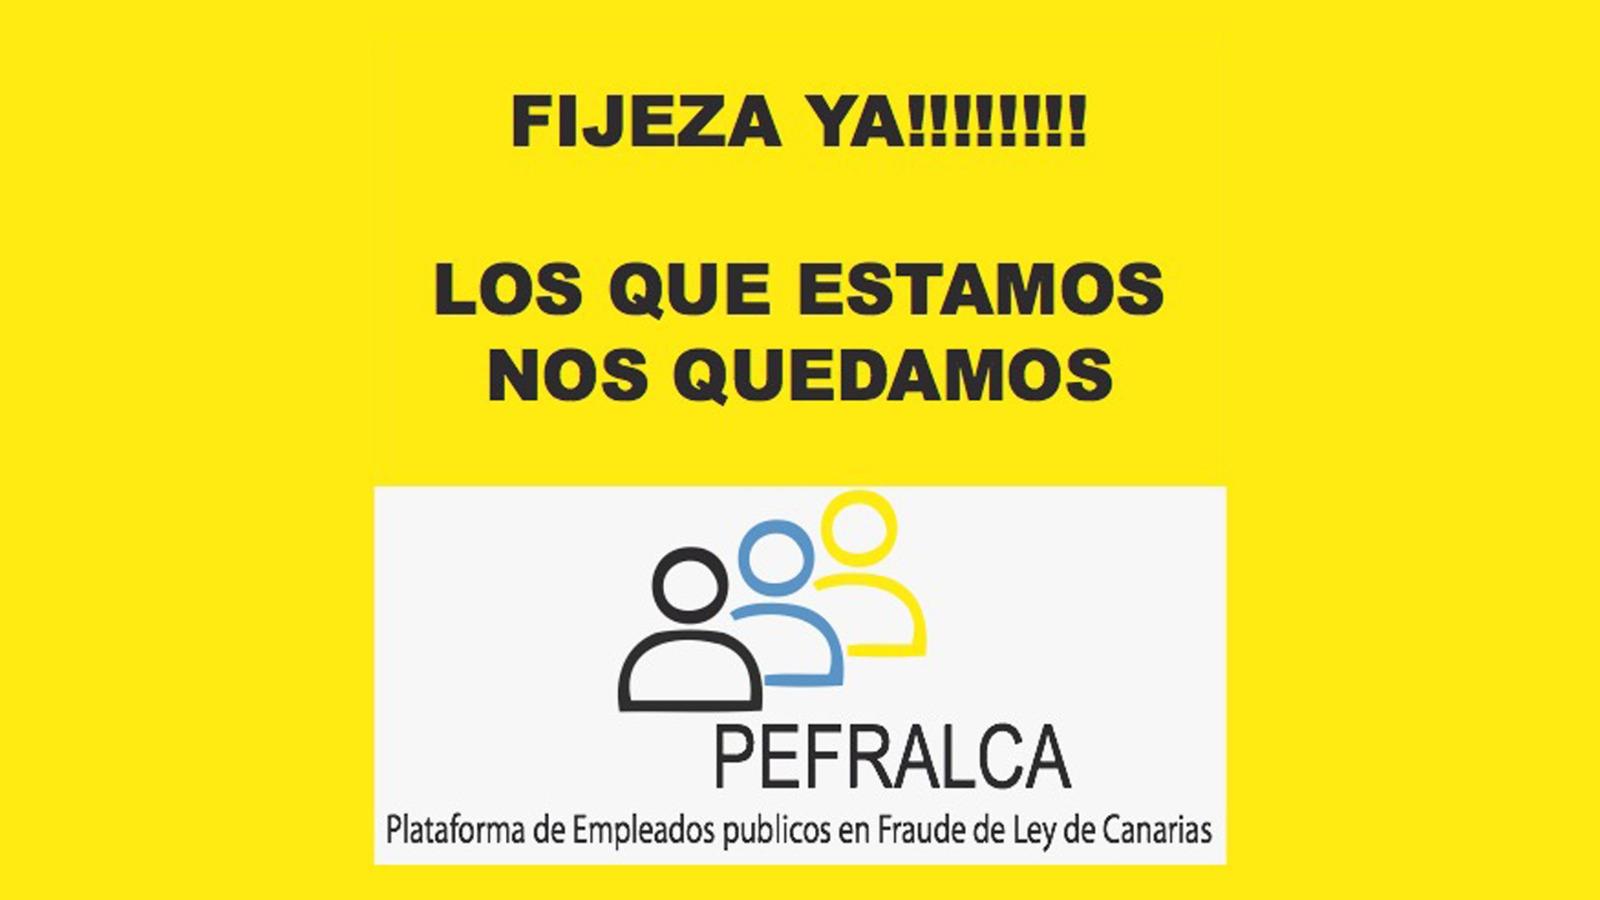 HUELGA CAJA RESISTENCIA PEFRALCA